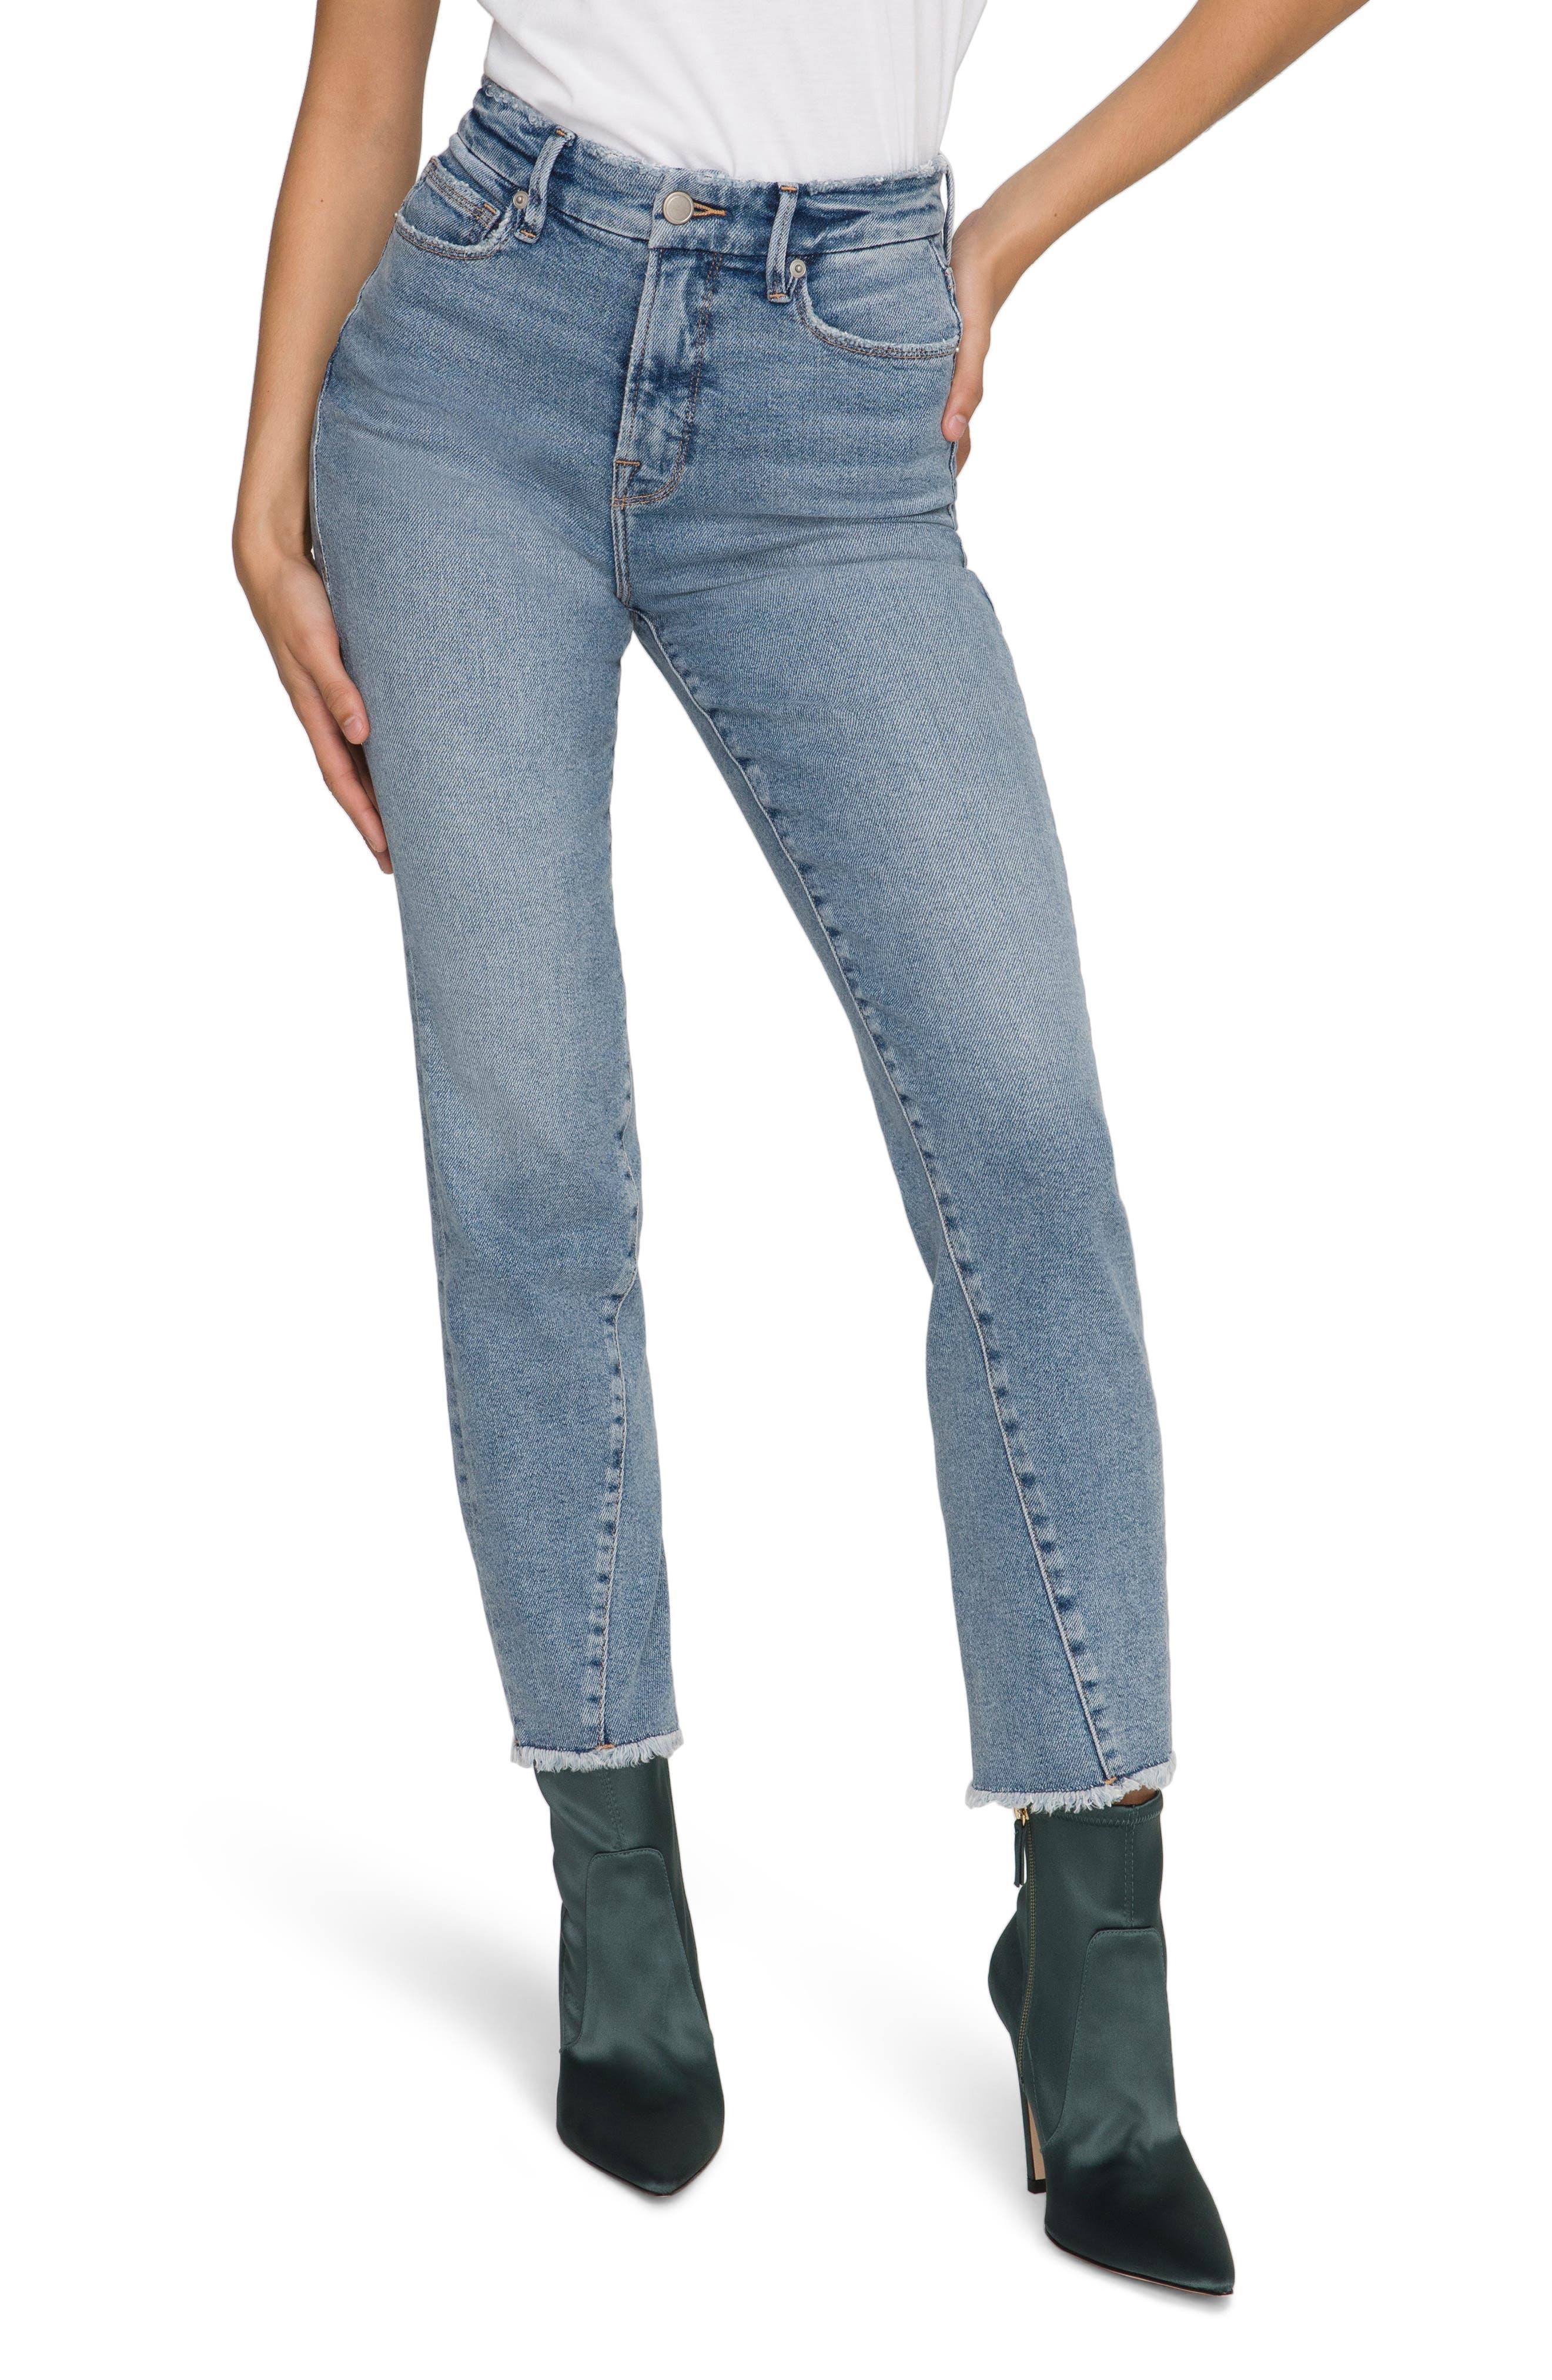 Women's Good American Good Vintage Twisted Seam Frayed Straight Leg Jeans